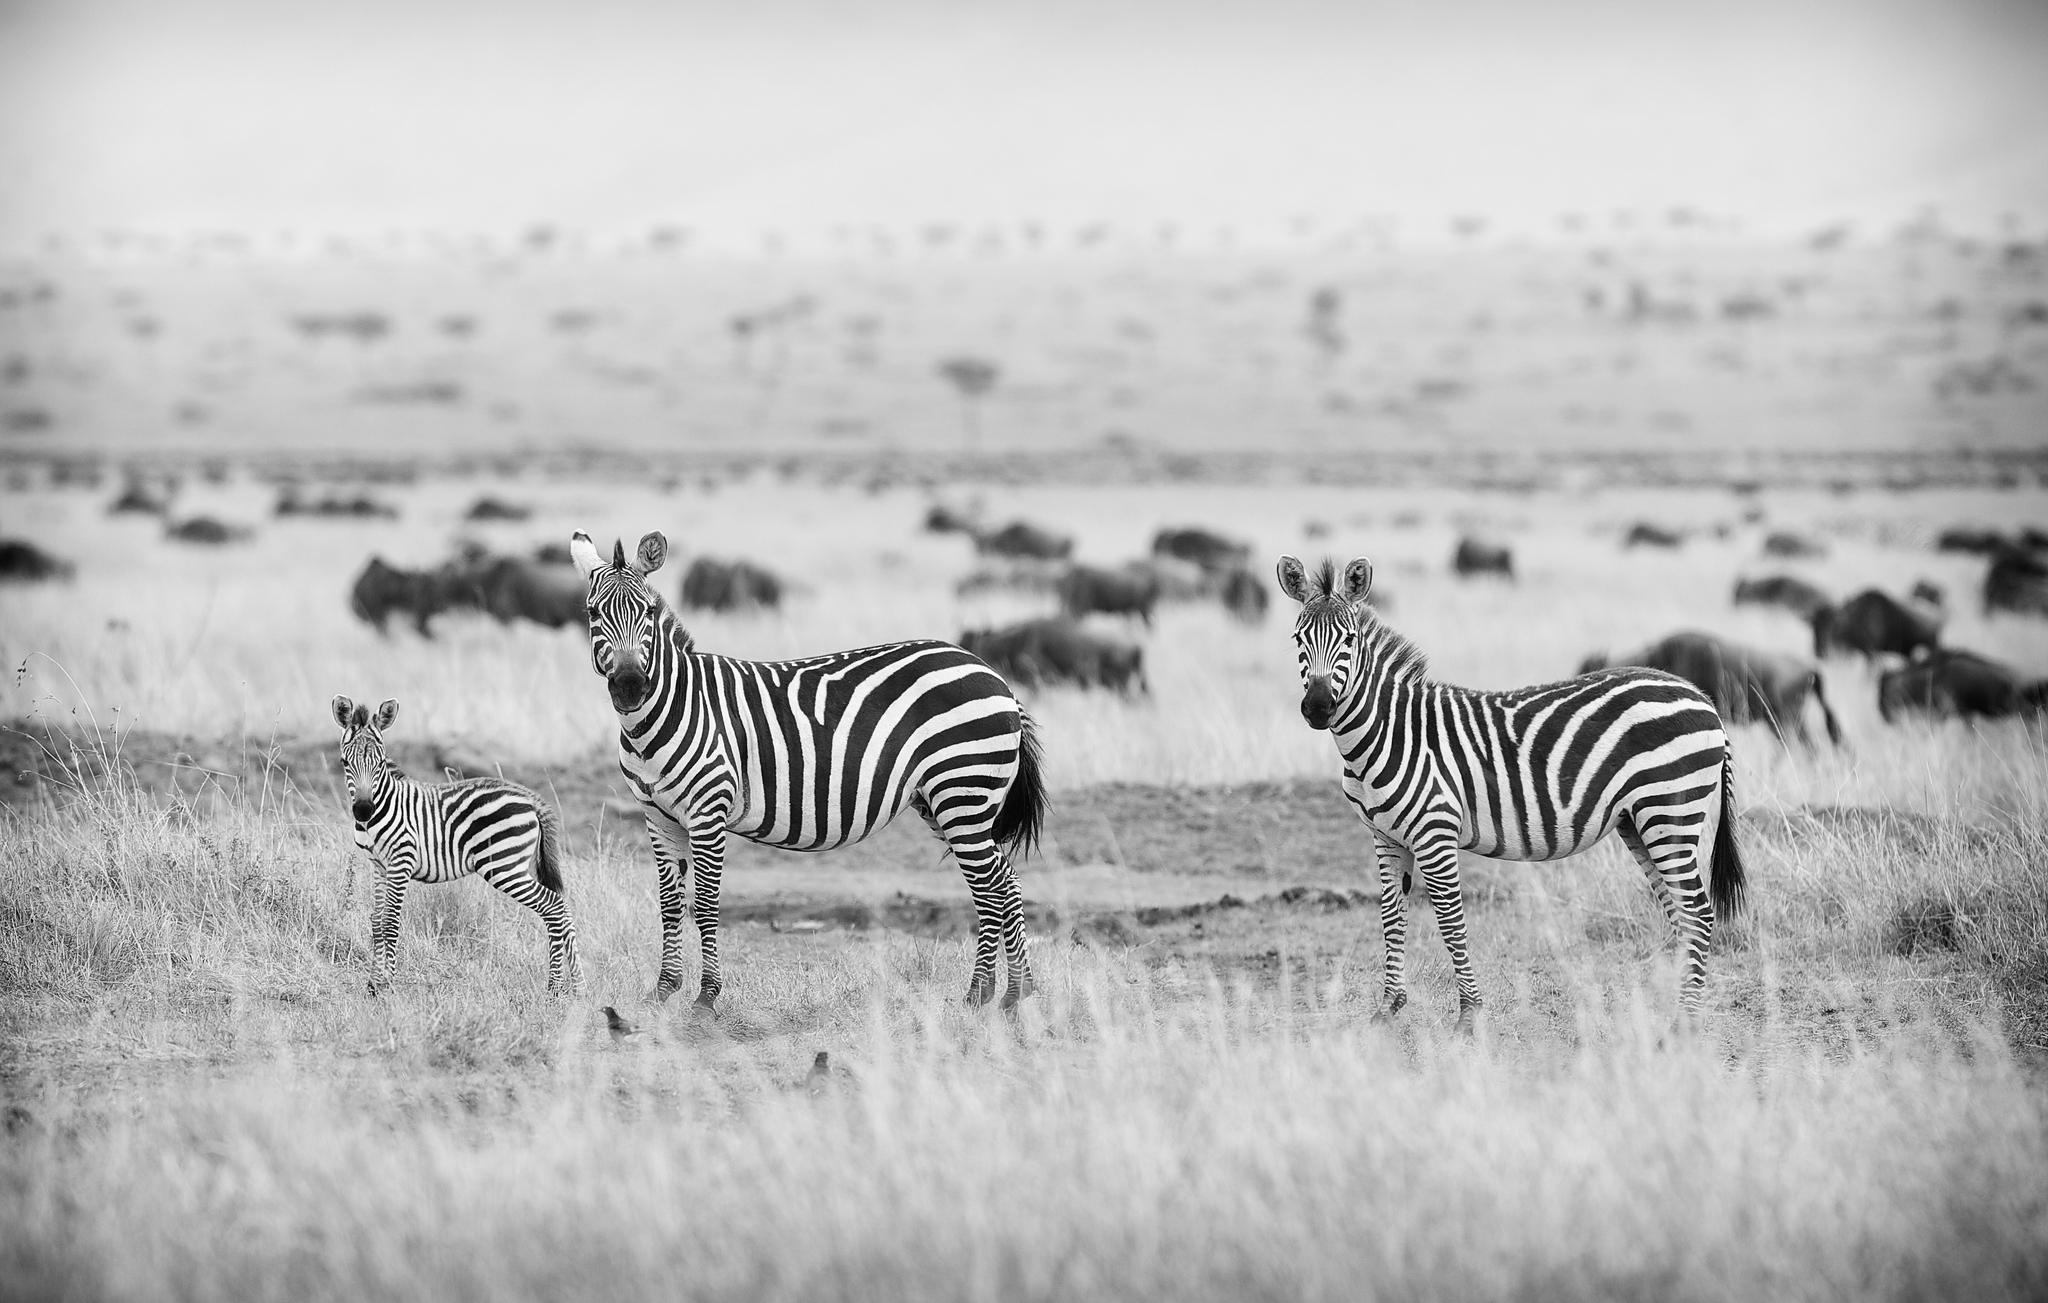 Stripes © Mark Bridger